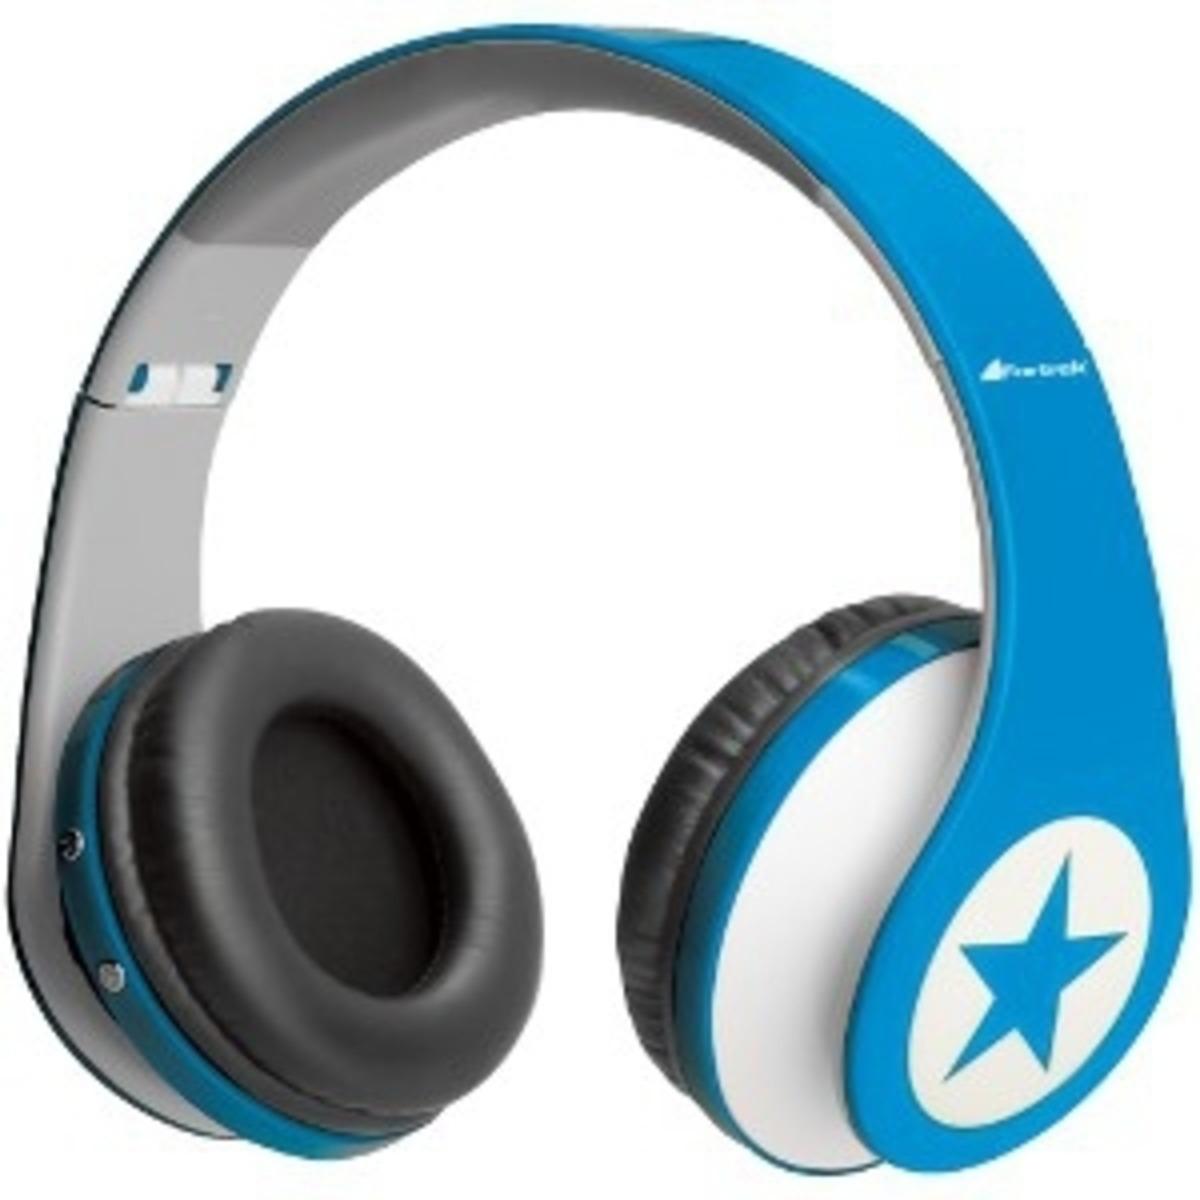 Fone de Ouvido Radical Beat MP3 HP902 Azul (Micro SD e Radio) - Fortrek